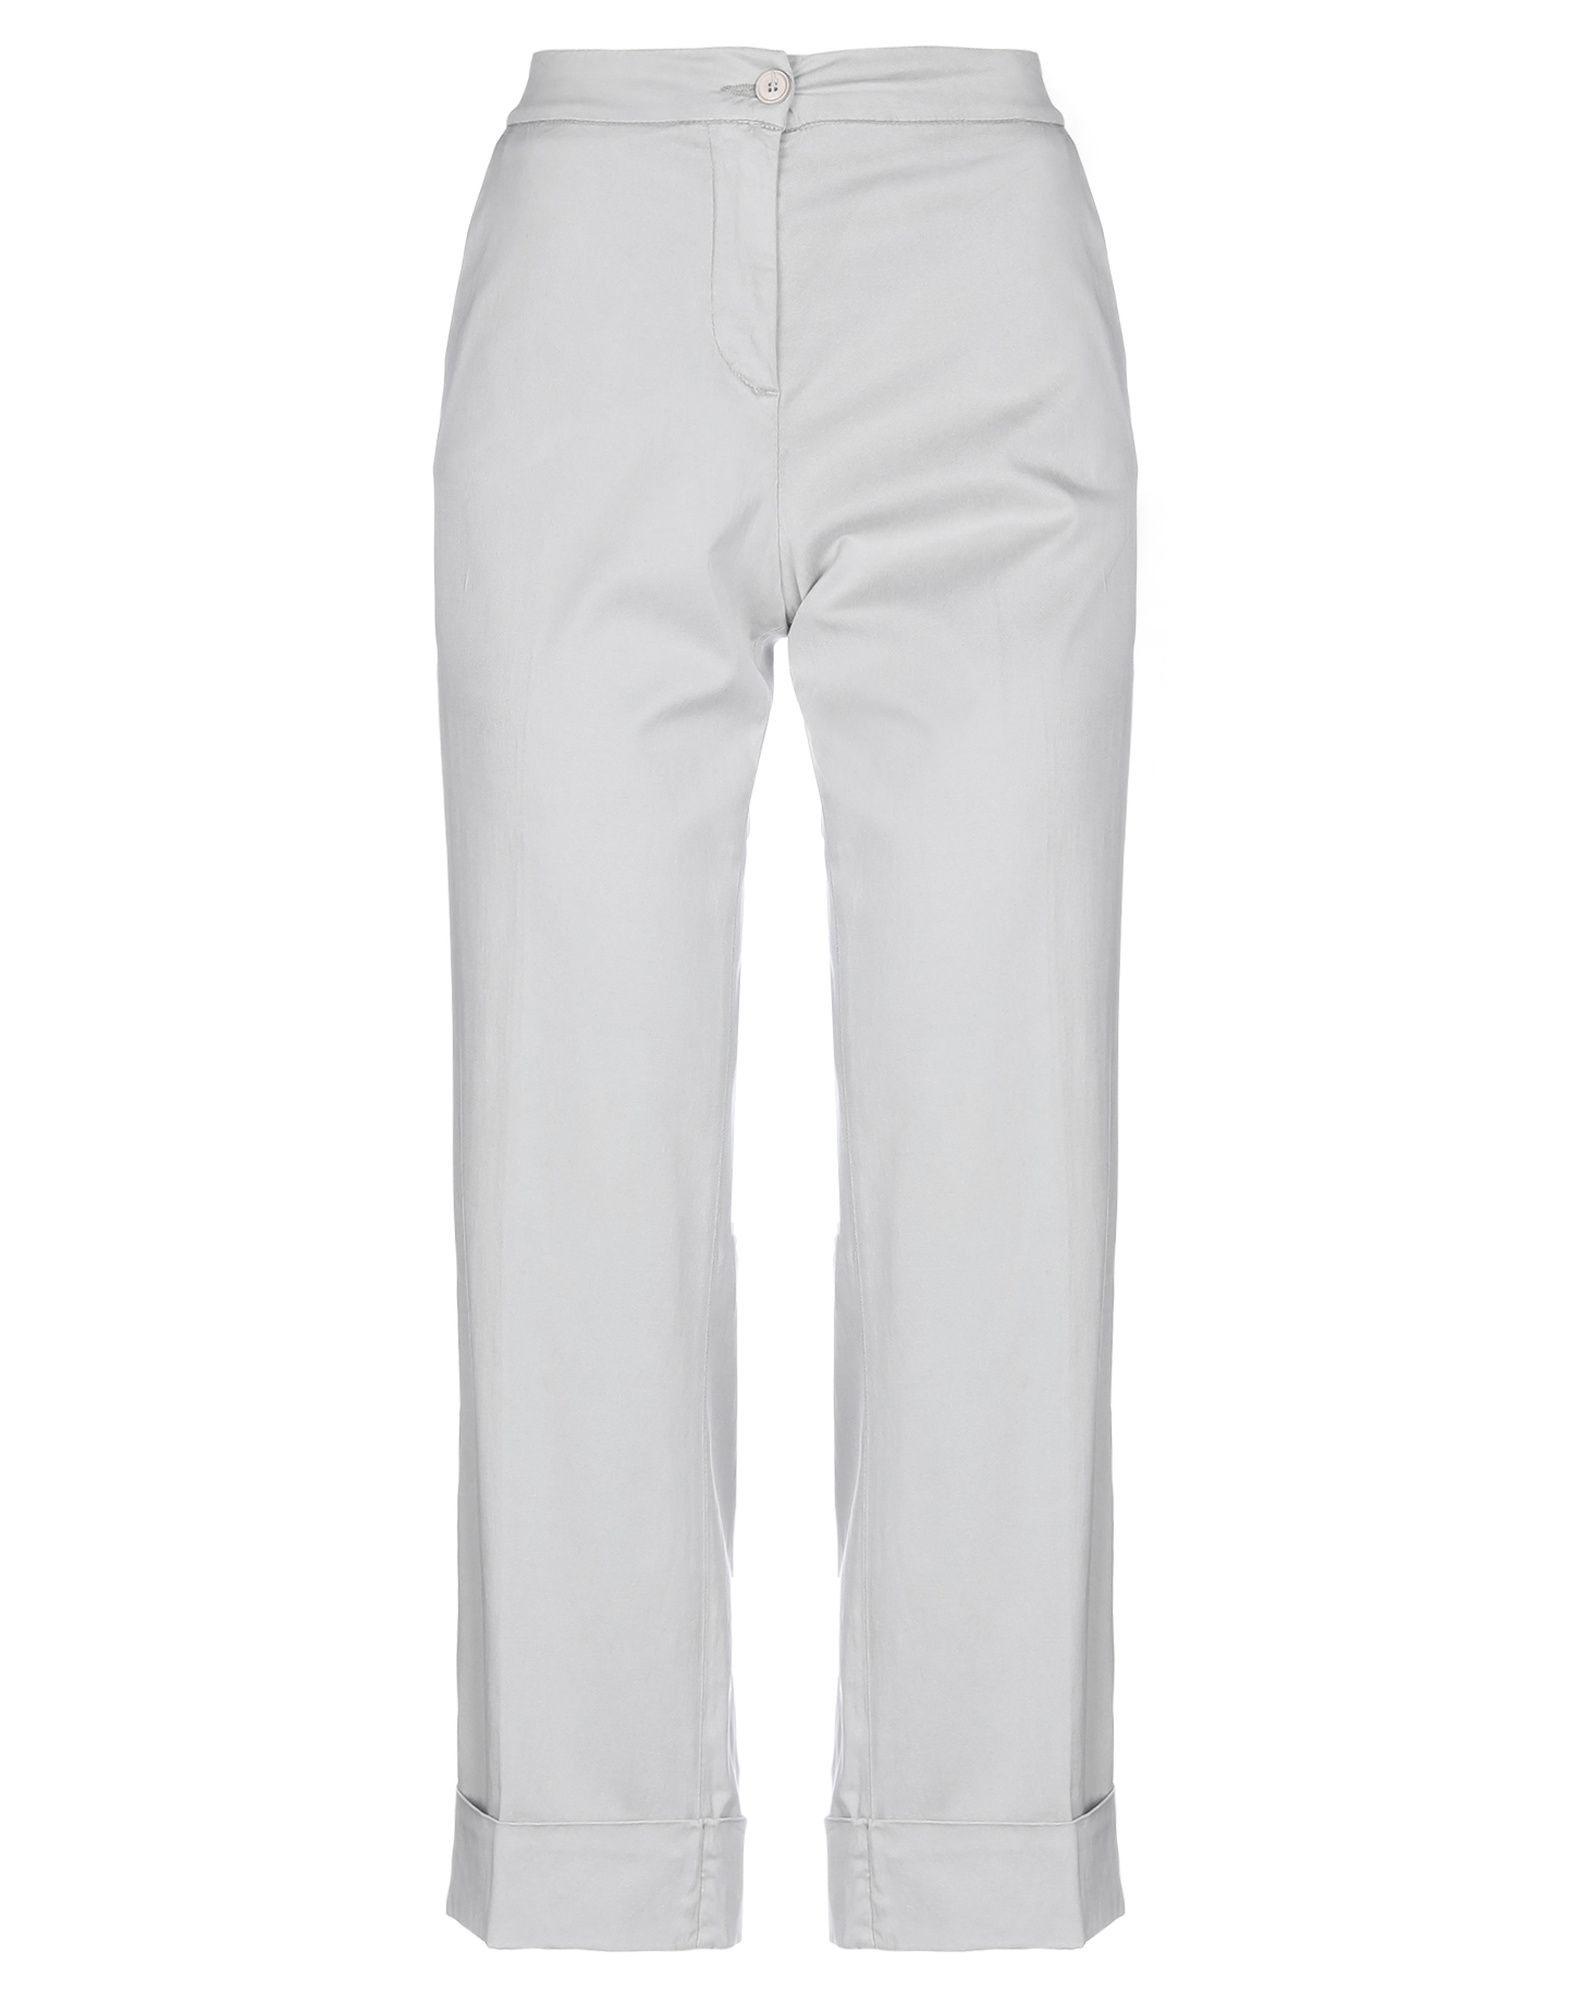 VIA MASINI 80 Повседневные брюки via delle rose повседневные брюки